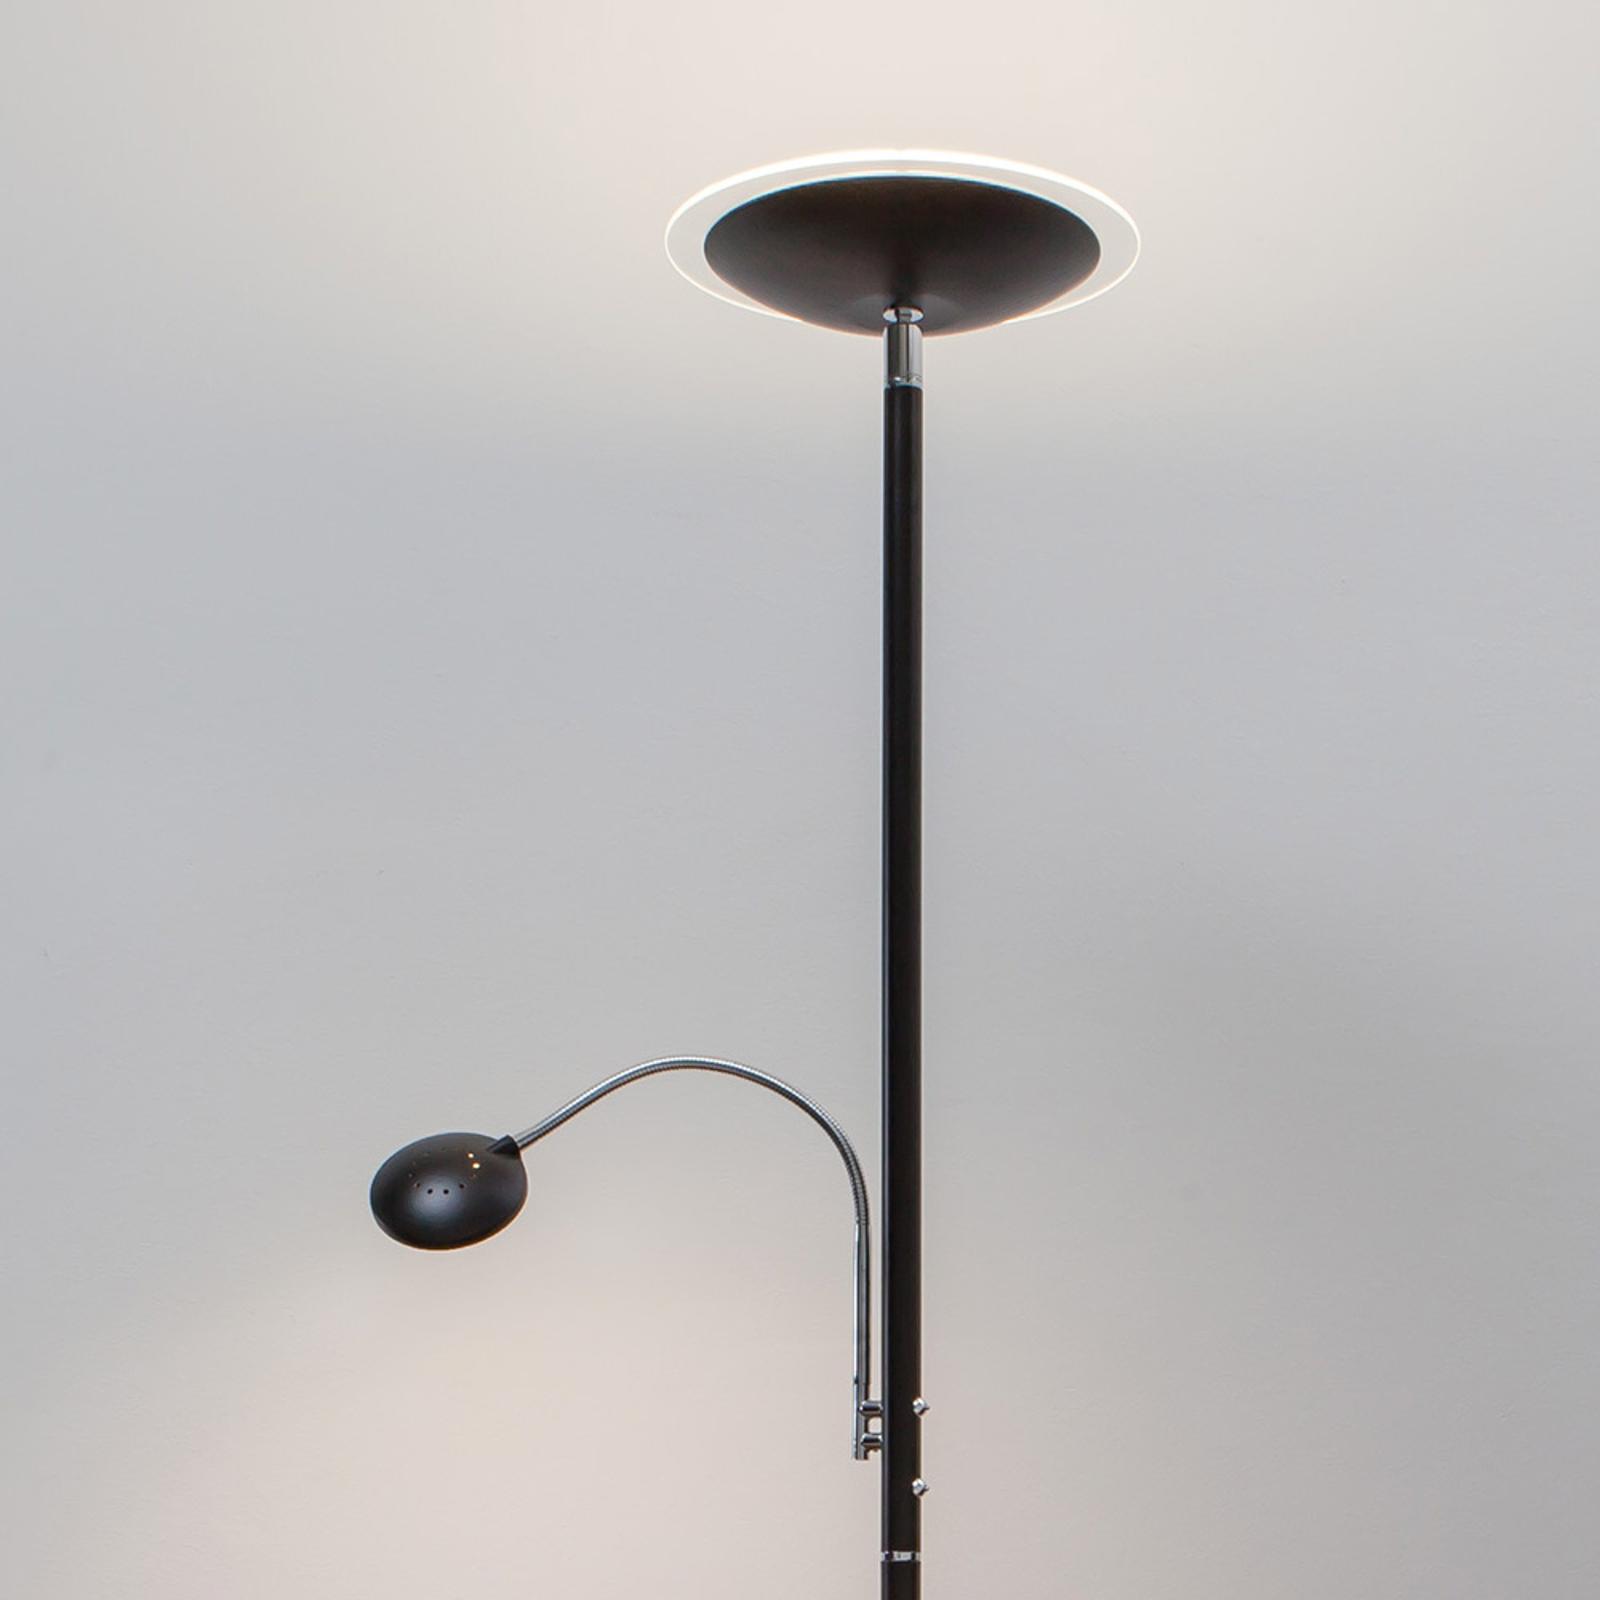 LED-uplight lampe Malea med lesearm, svart